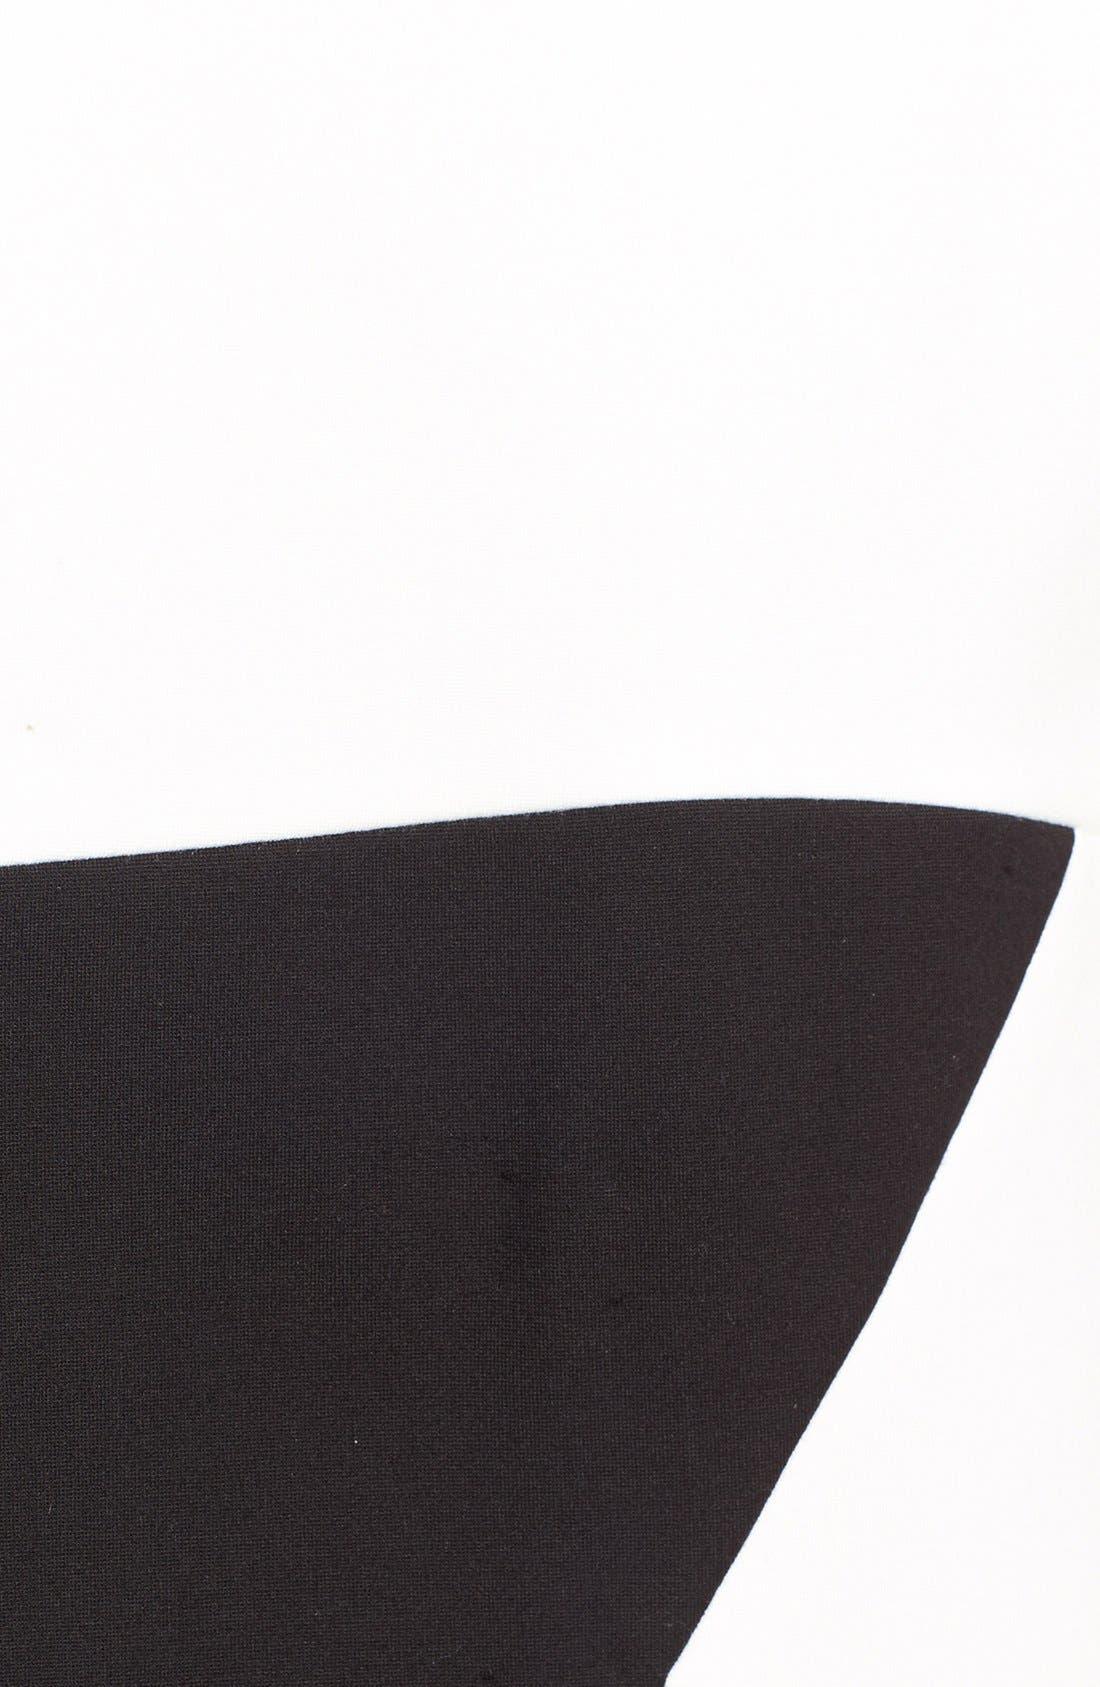 Colorblock Sheath Dress,                             Alternate thumbnail 3, color,                             006